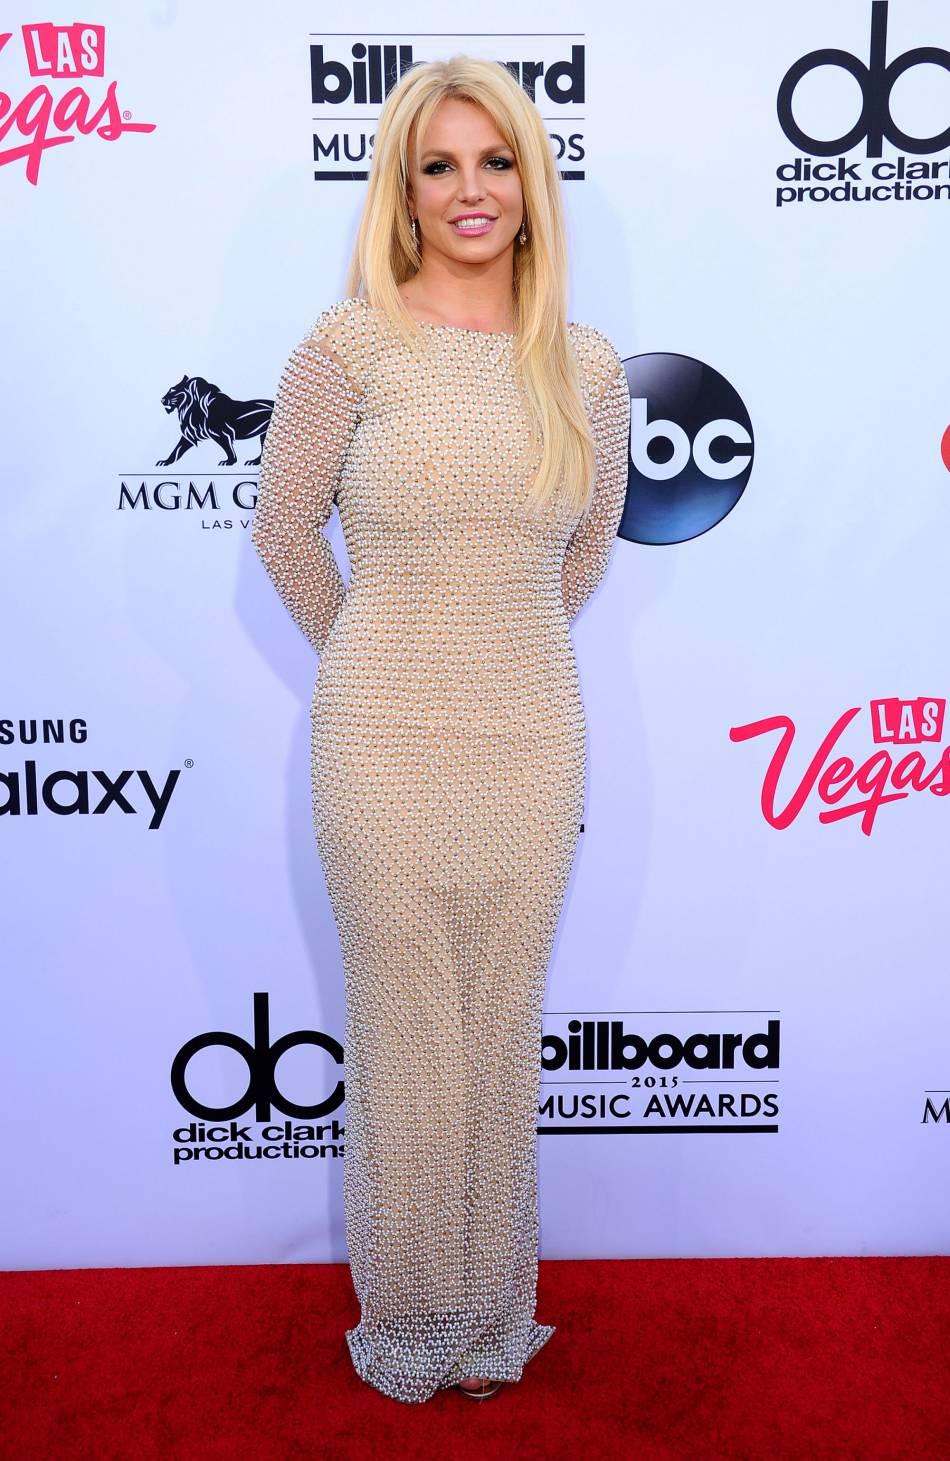 Britney Spears porte toujours des robes aussi moulantes...